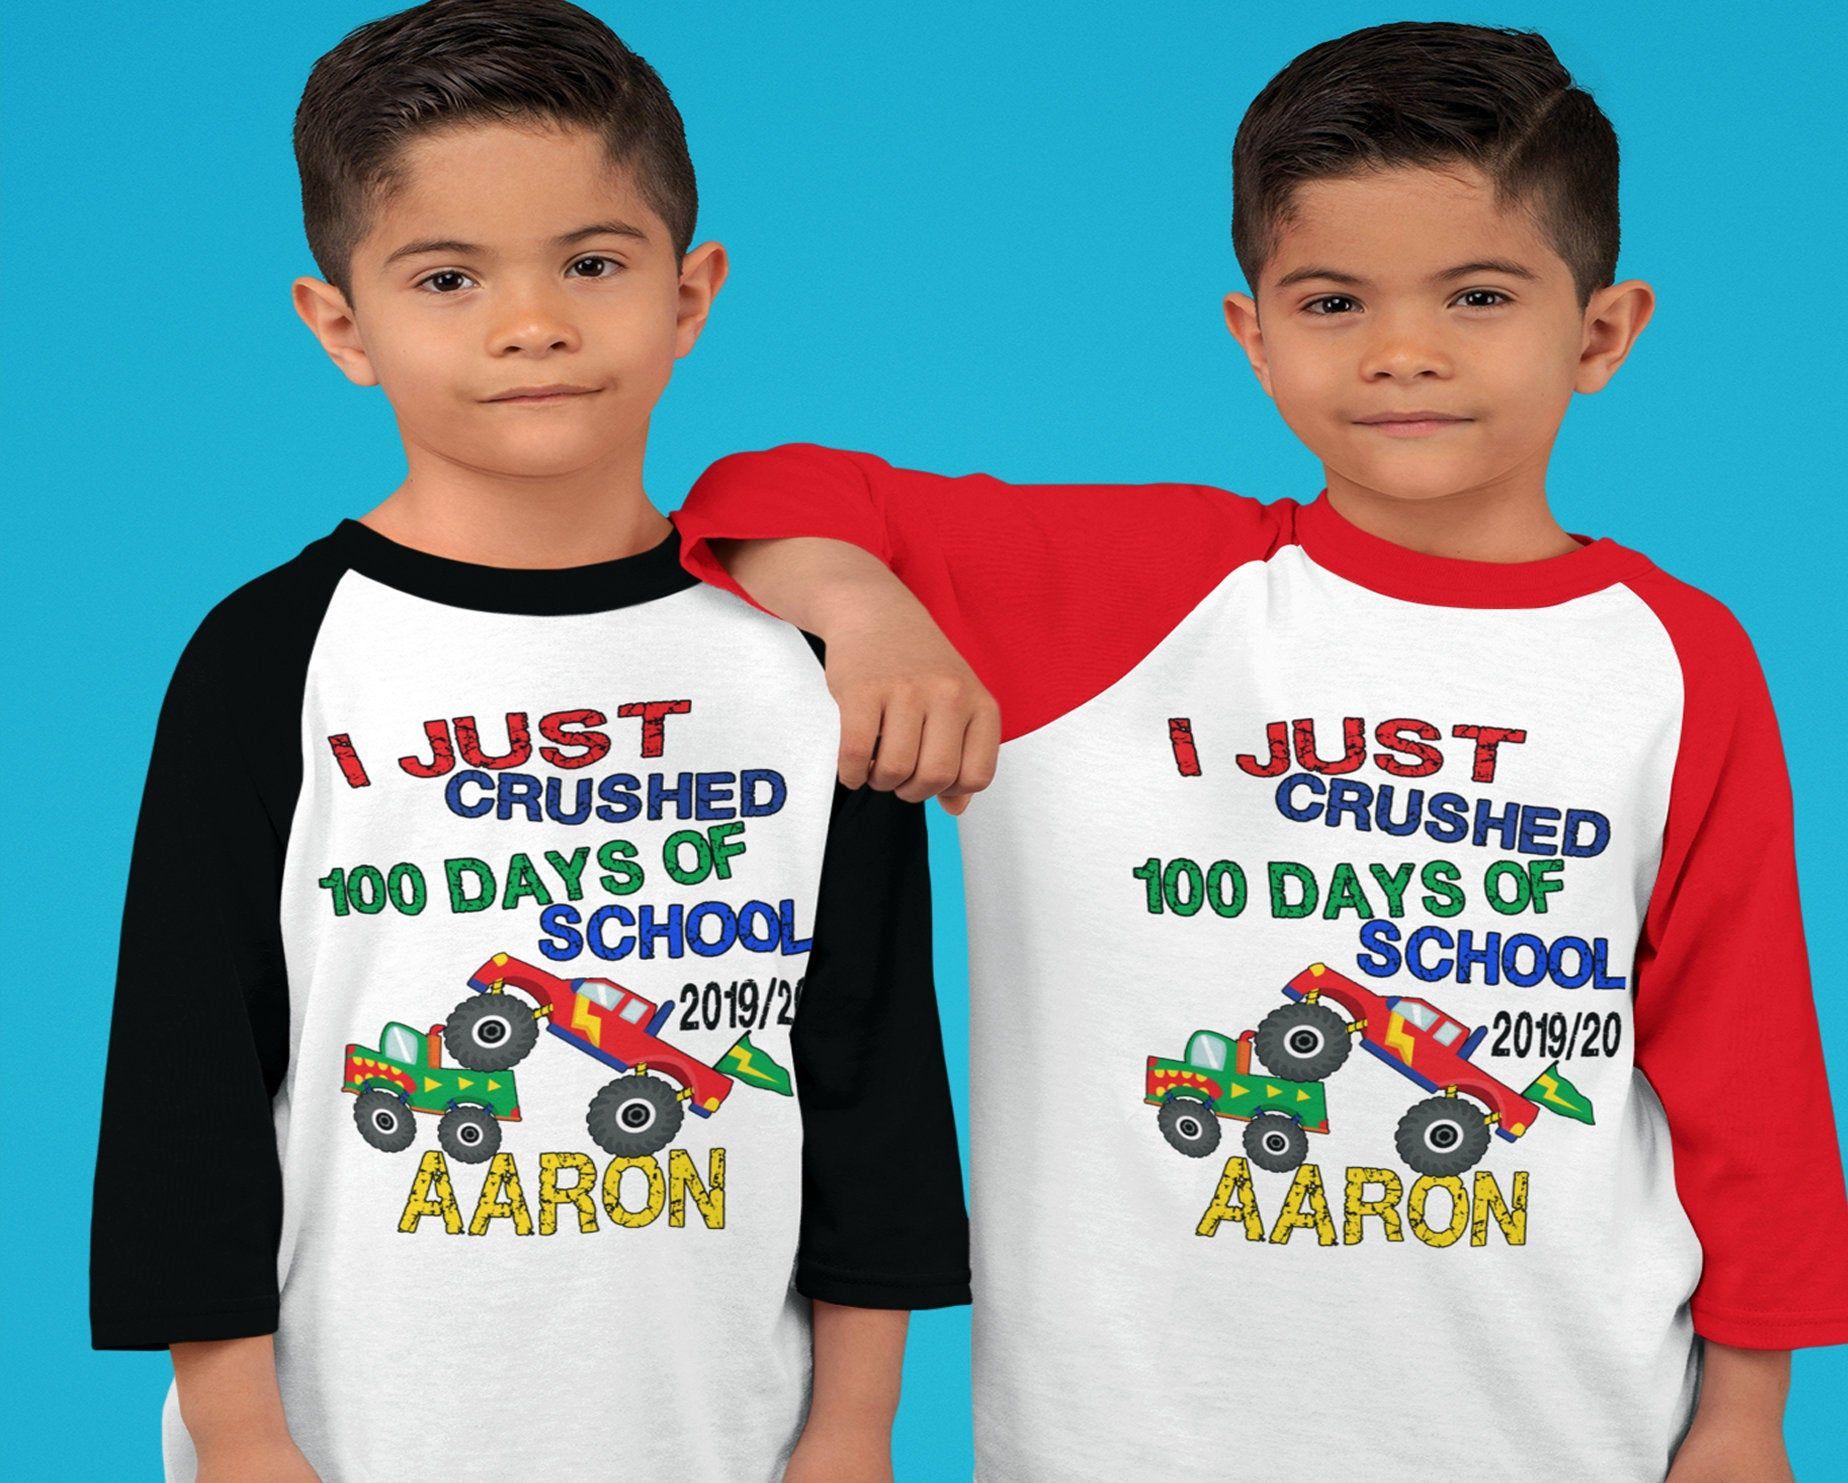 100 days of School Shirt - I just Crushed 100 days of School Raglan - 4x4 monster truck shirt - boys Personalized 100th day of school shirt #100daysofschoolshirt